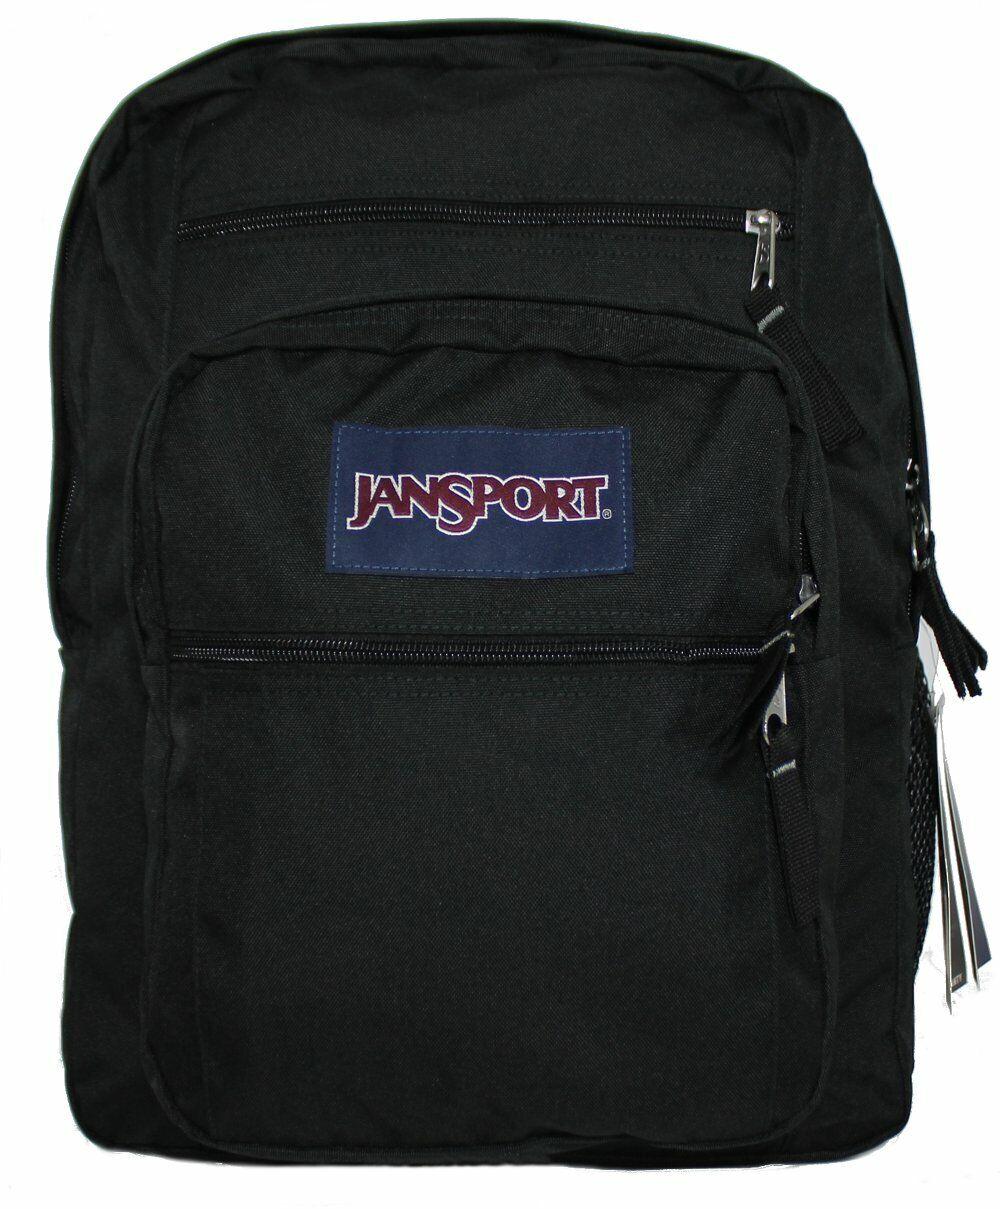 JanSport Big Student Backpack, 15 inch Laptop Sleeve, 34L Ca